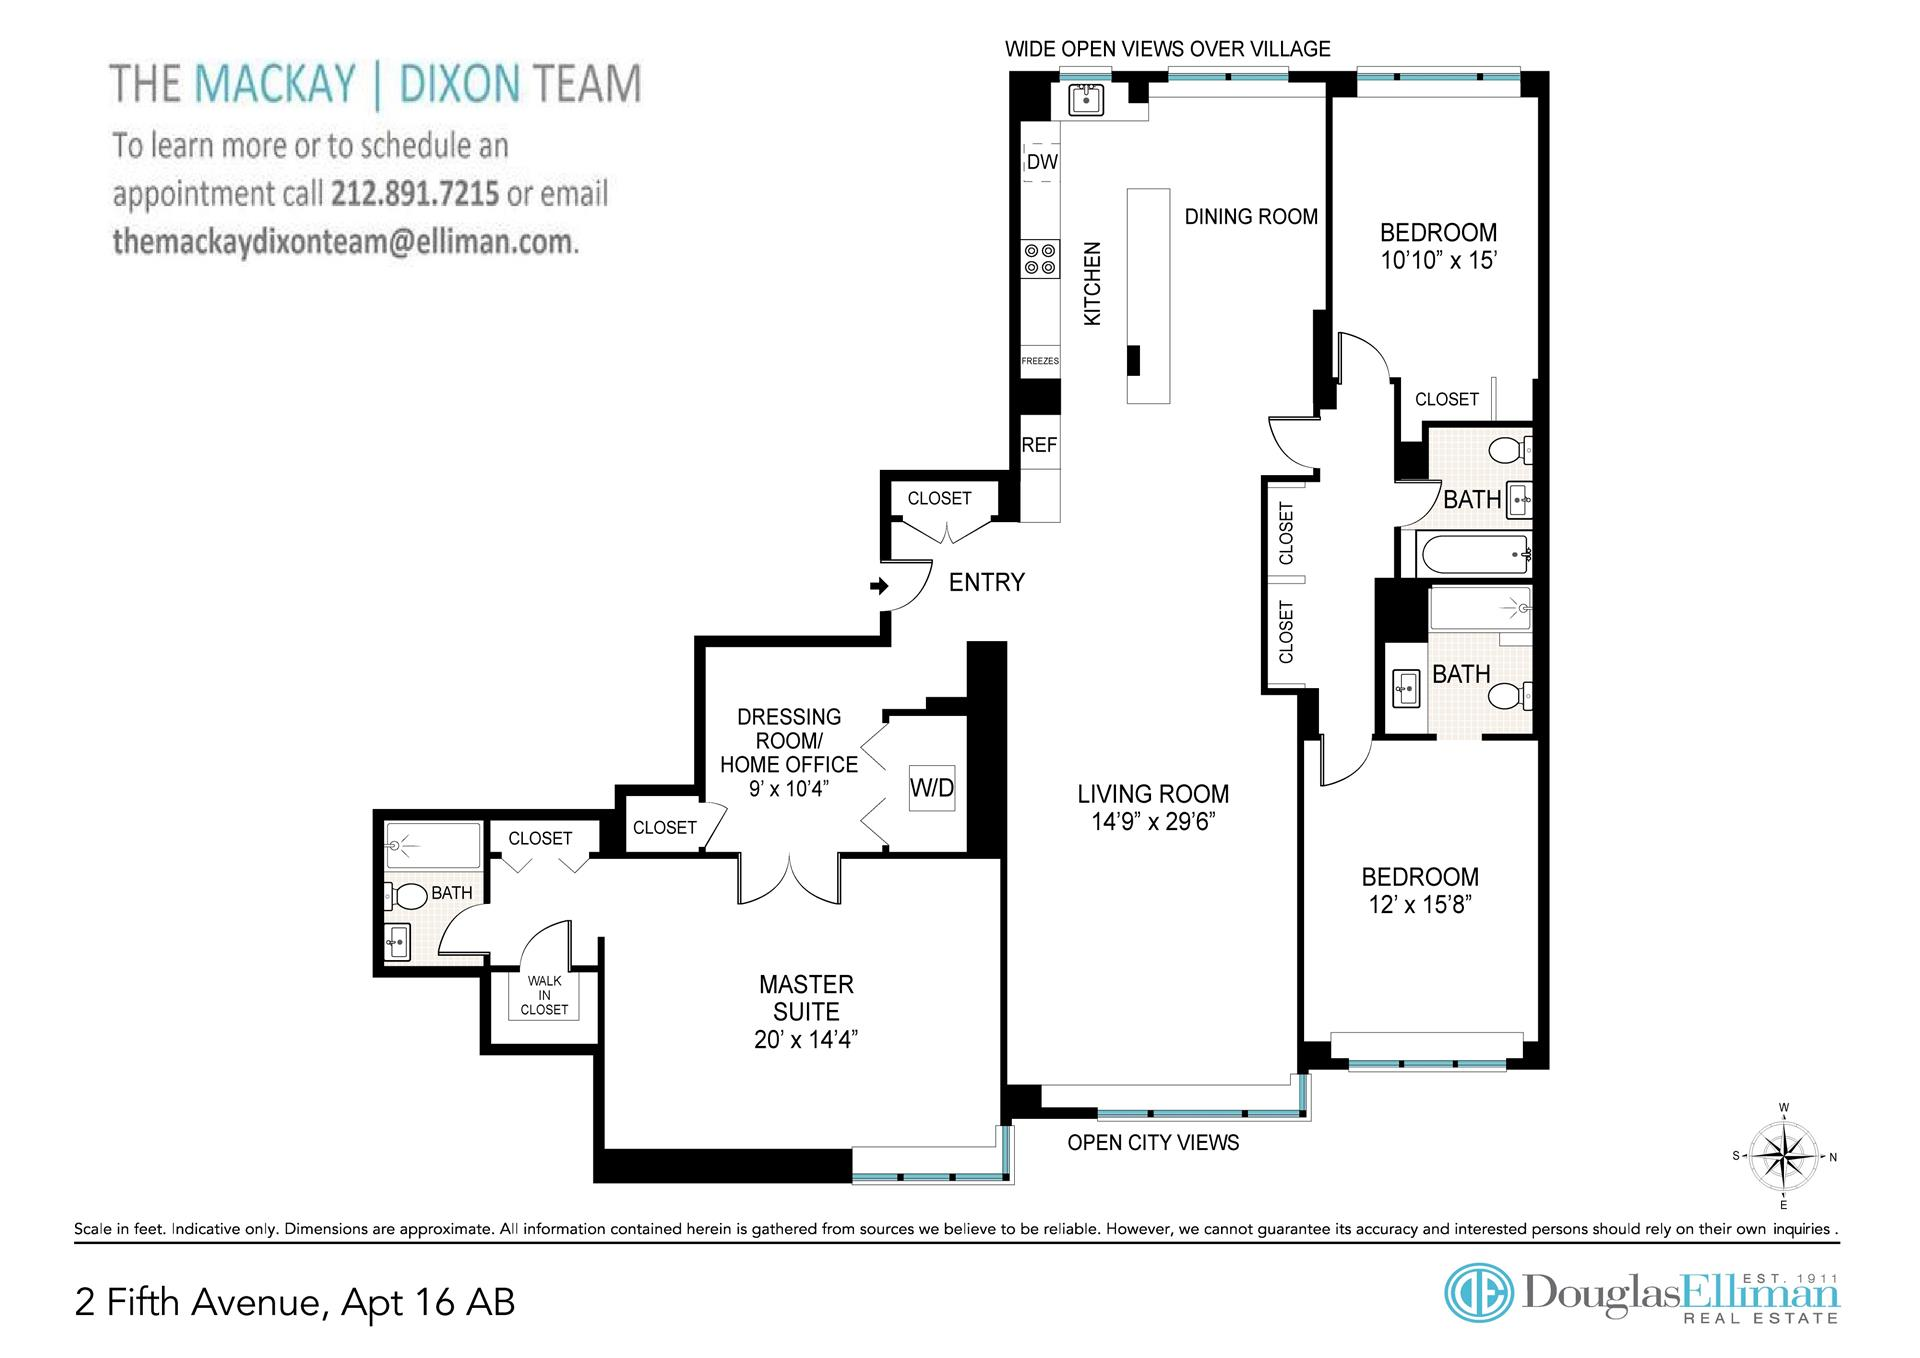 Floor plan of 2 Fifth Avenue, 16AB - Greenwich Village, New York